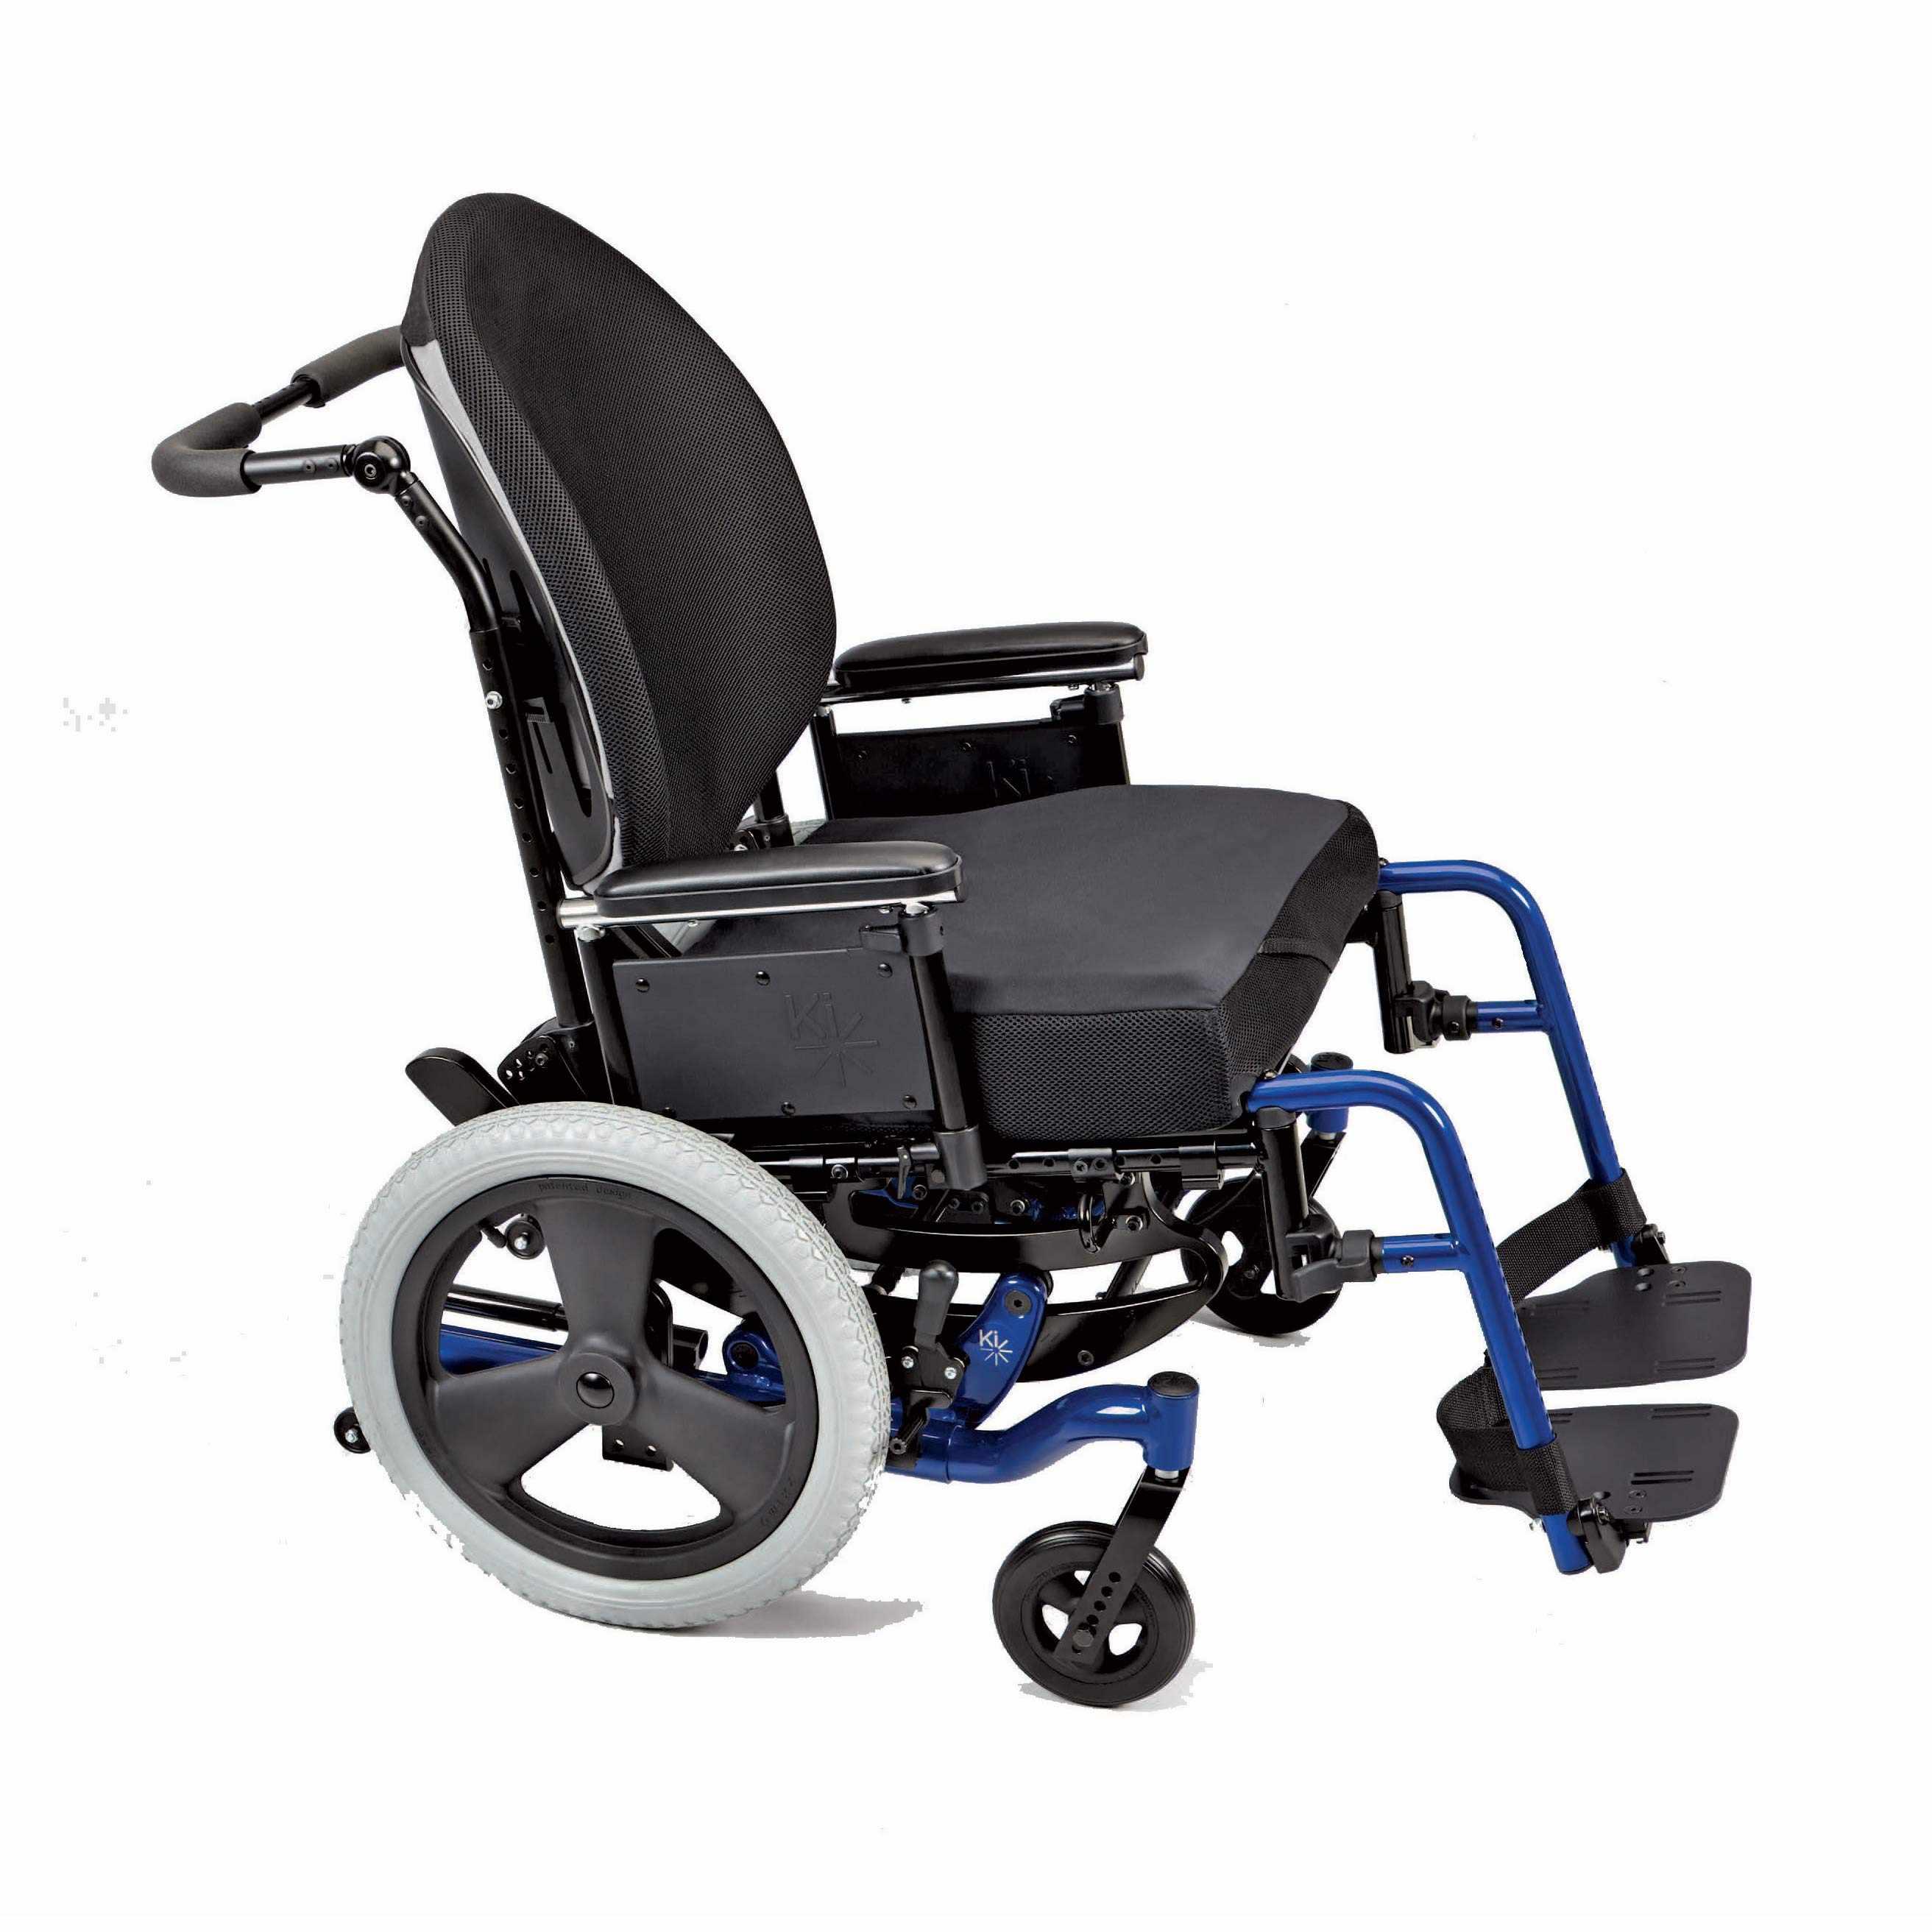 Ki Mobility Focus CR tilt manual wheelchair